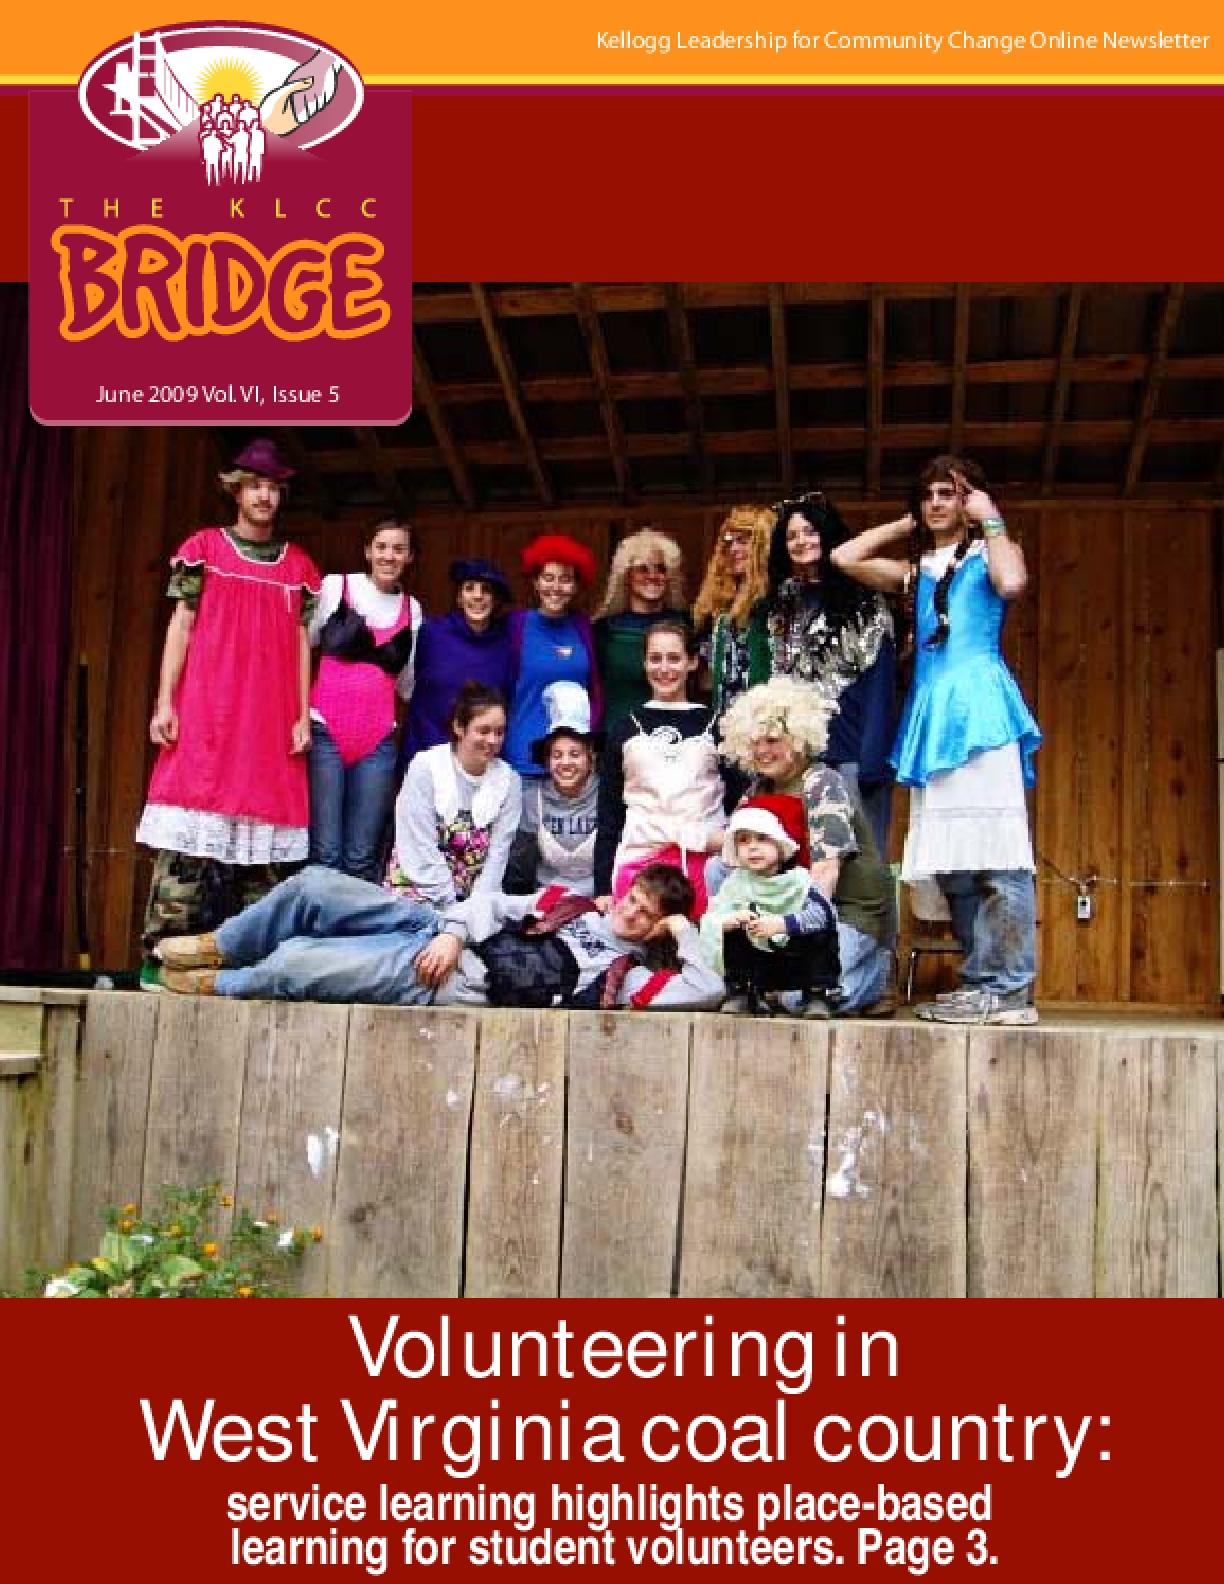 KLCC Bridge -- June 2009: Volunteering in West Virginia Coal Country